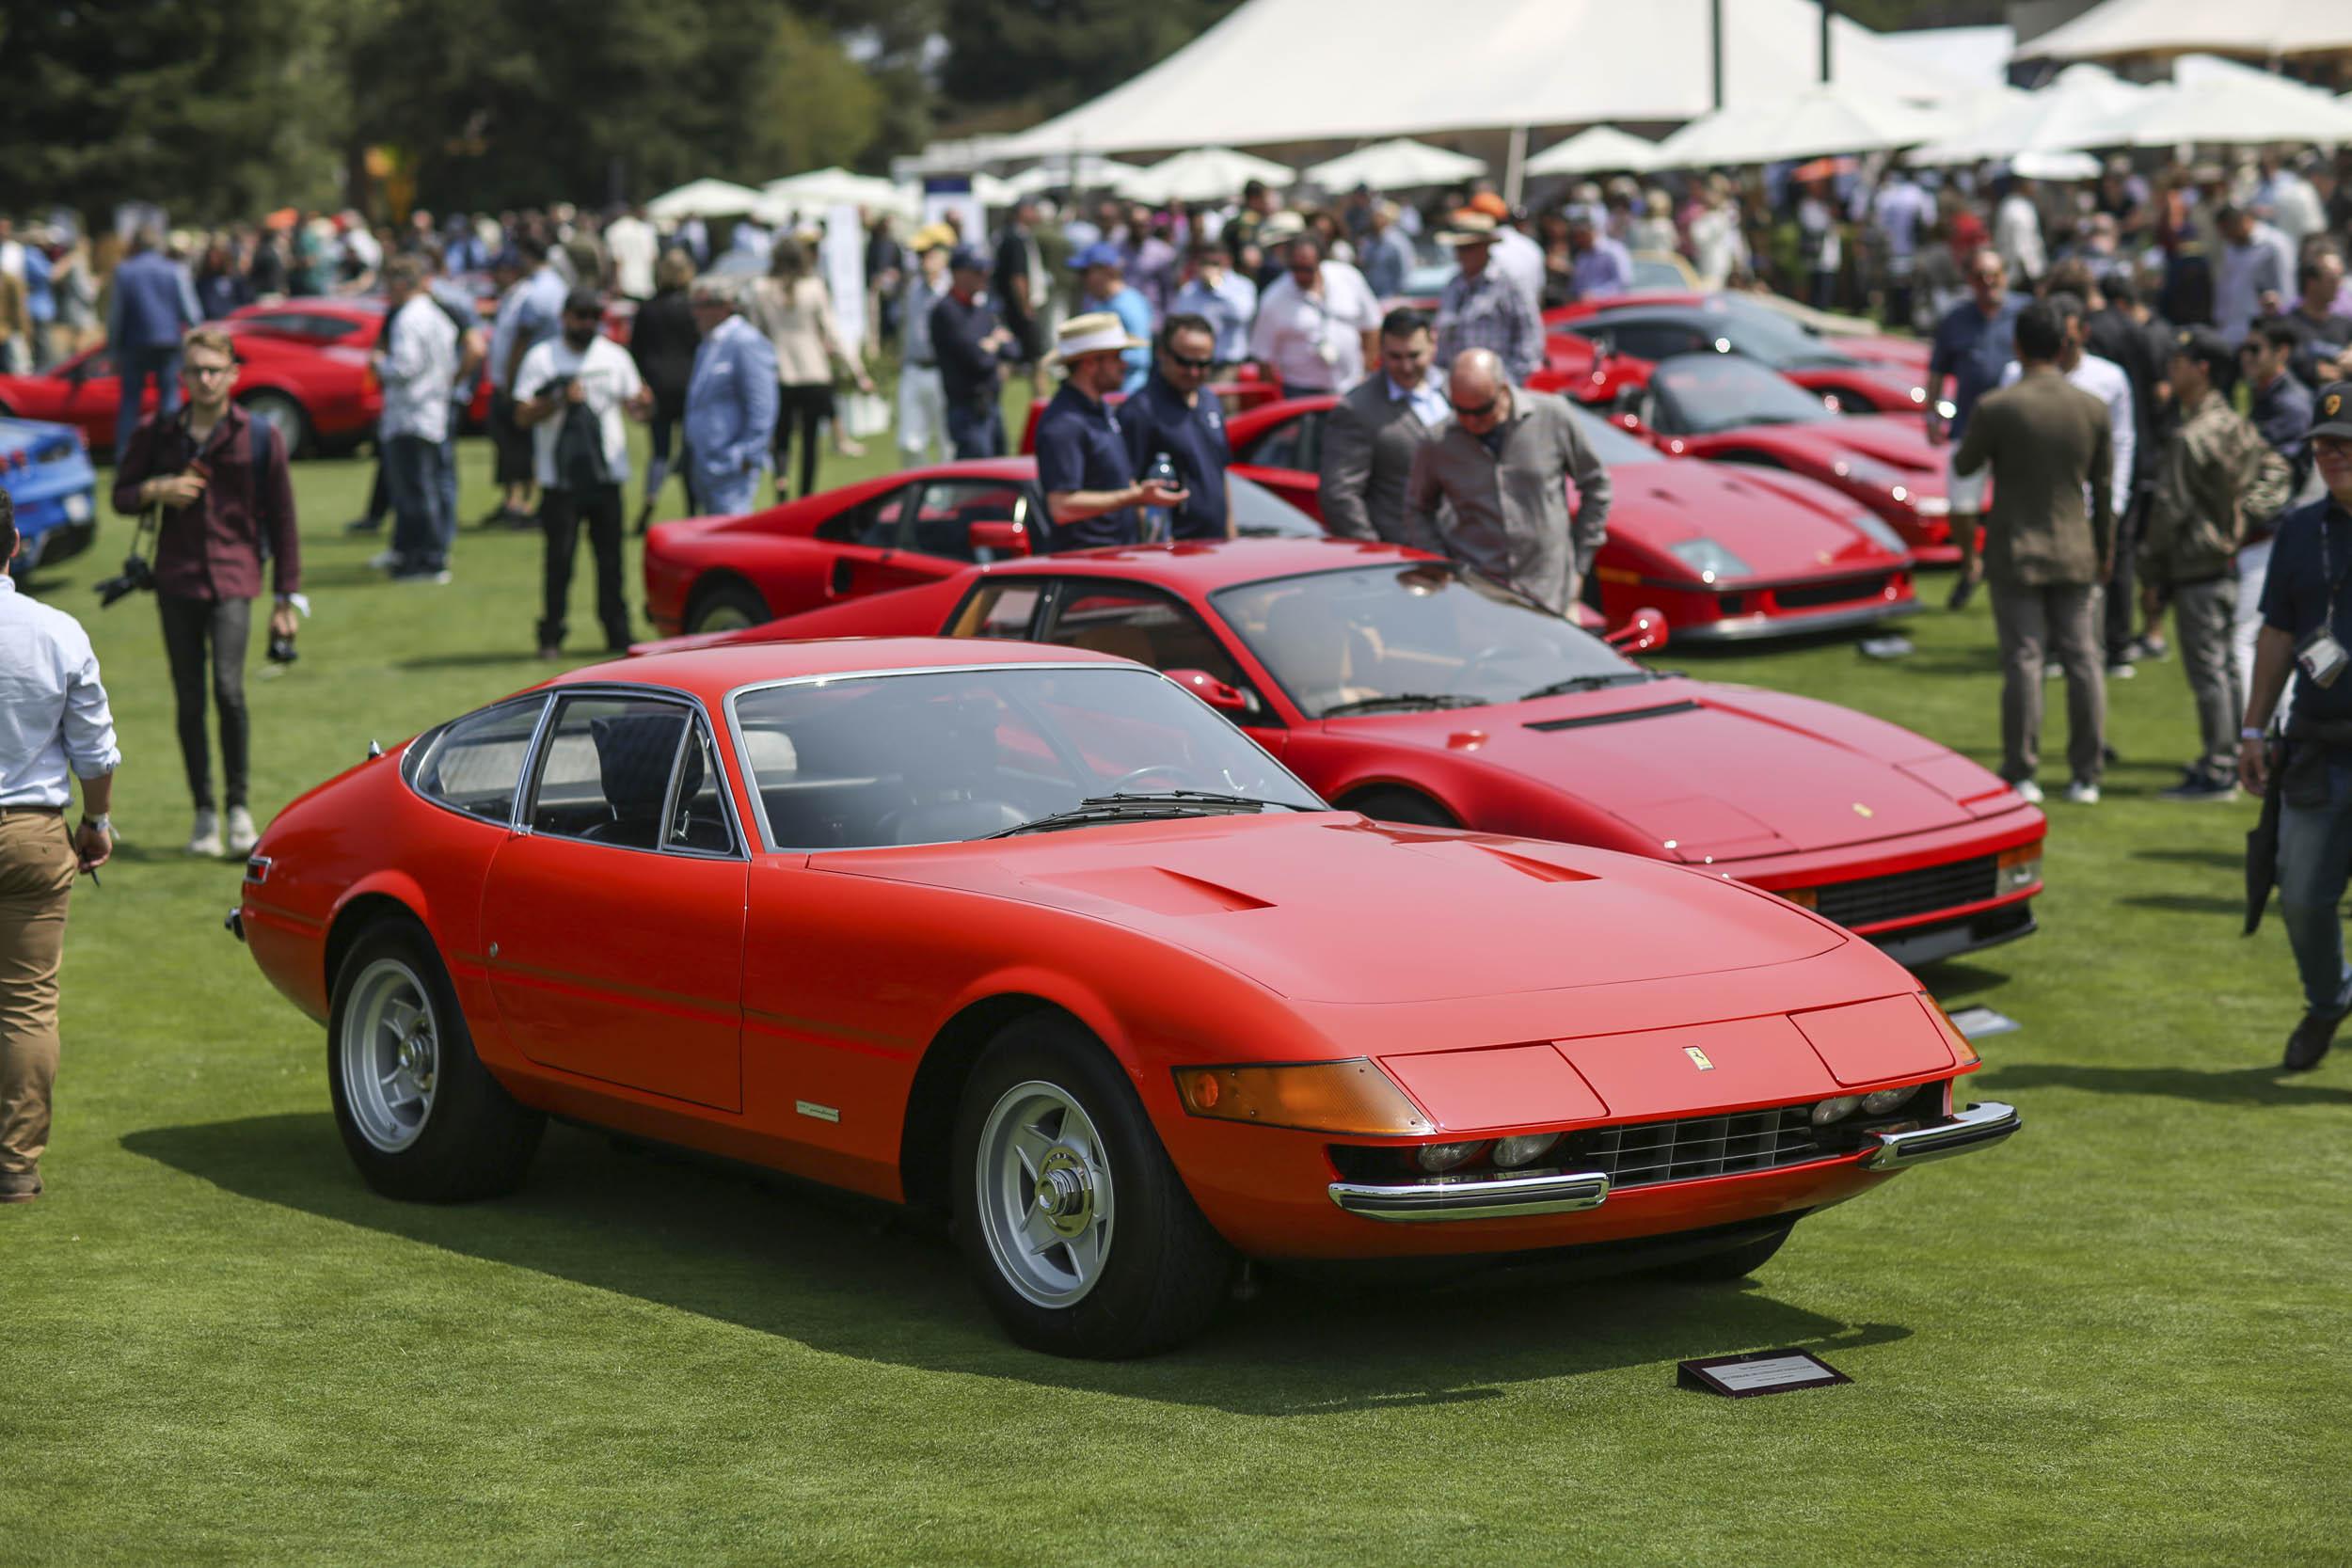 Ferrari's at The Quail